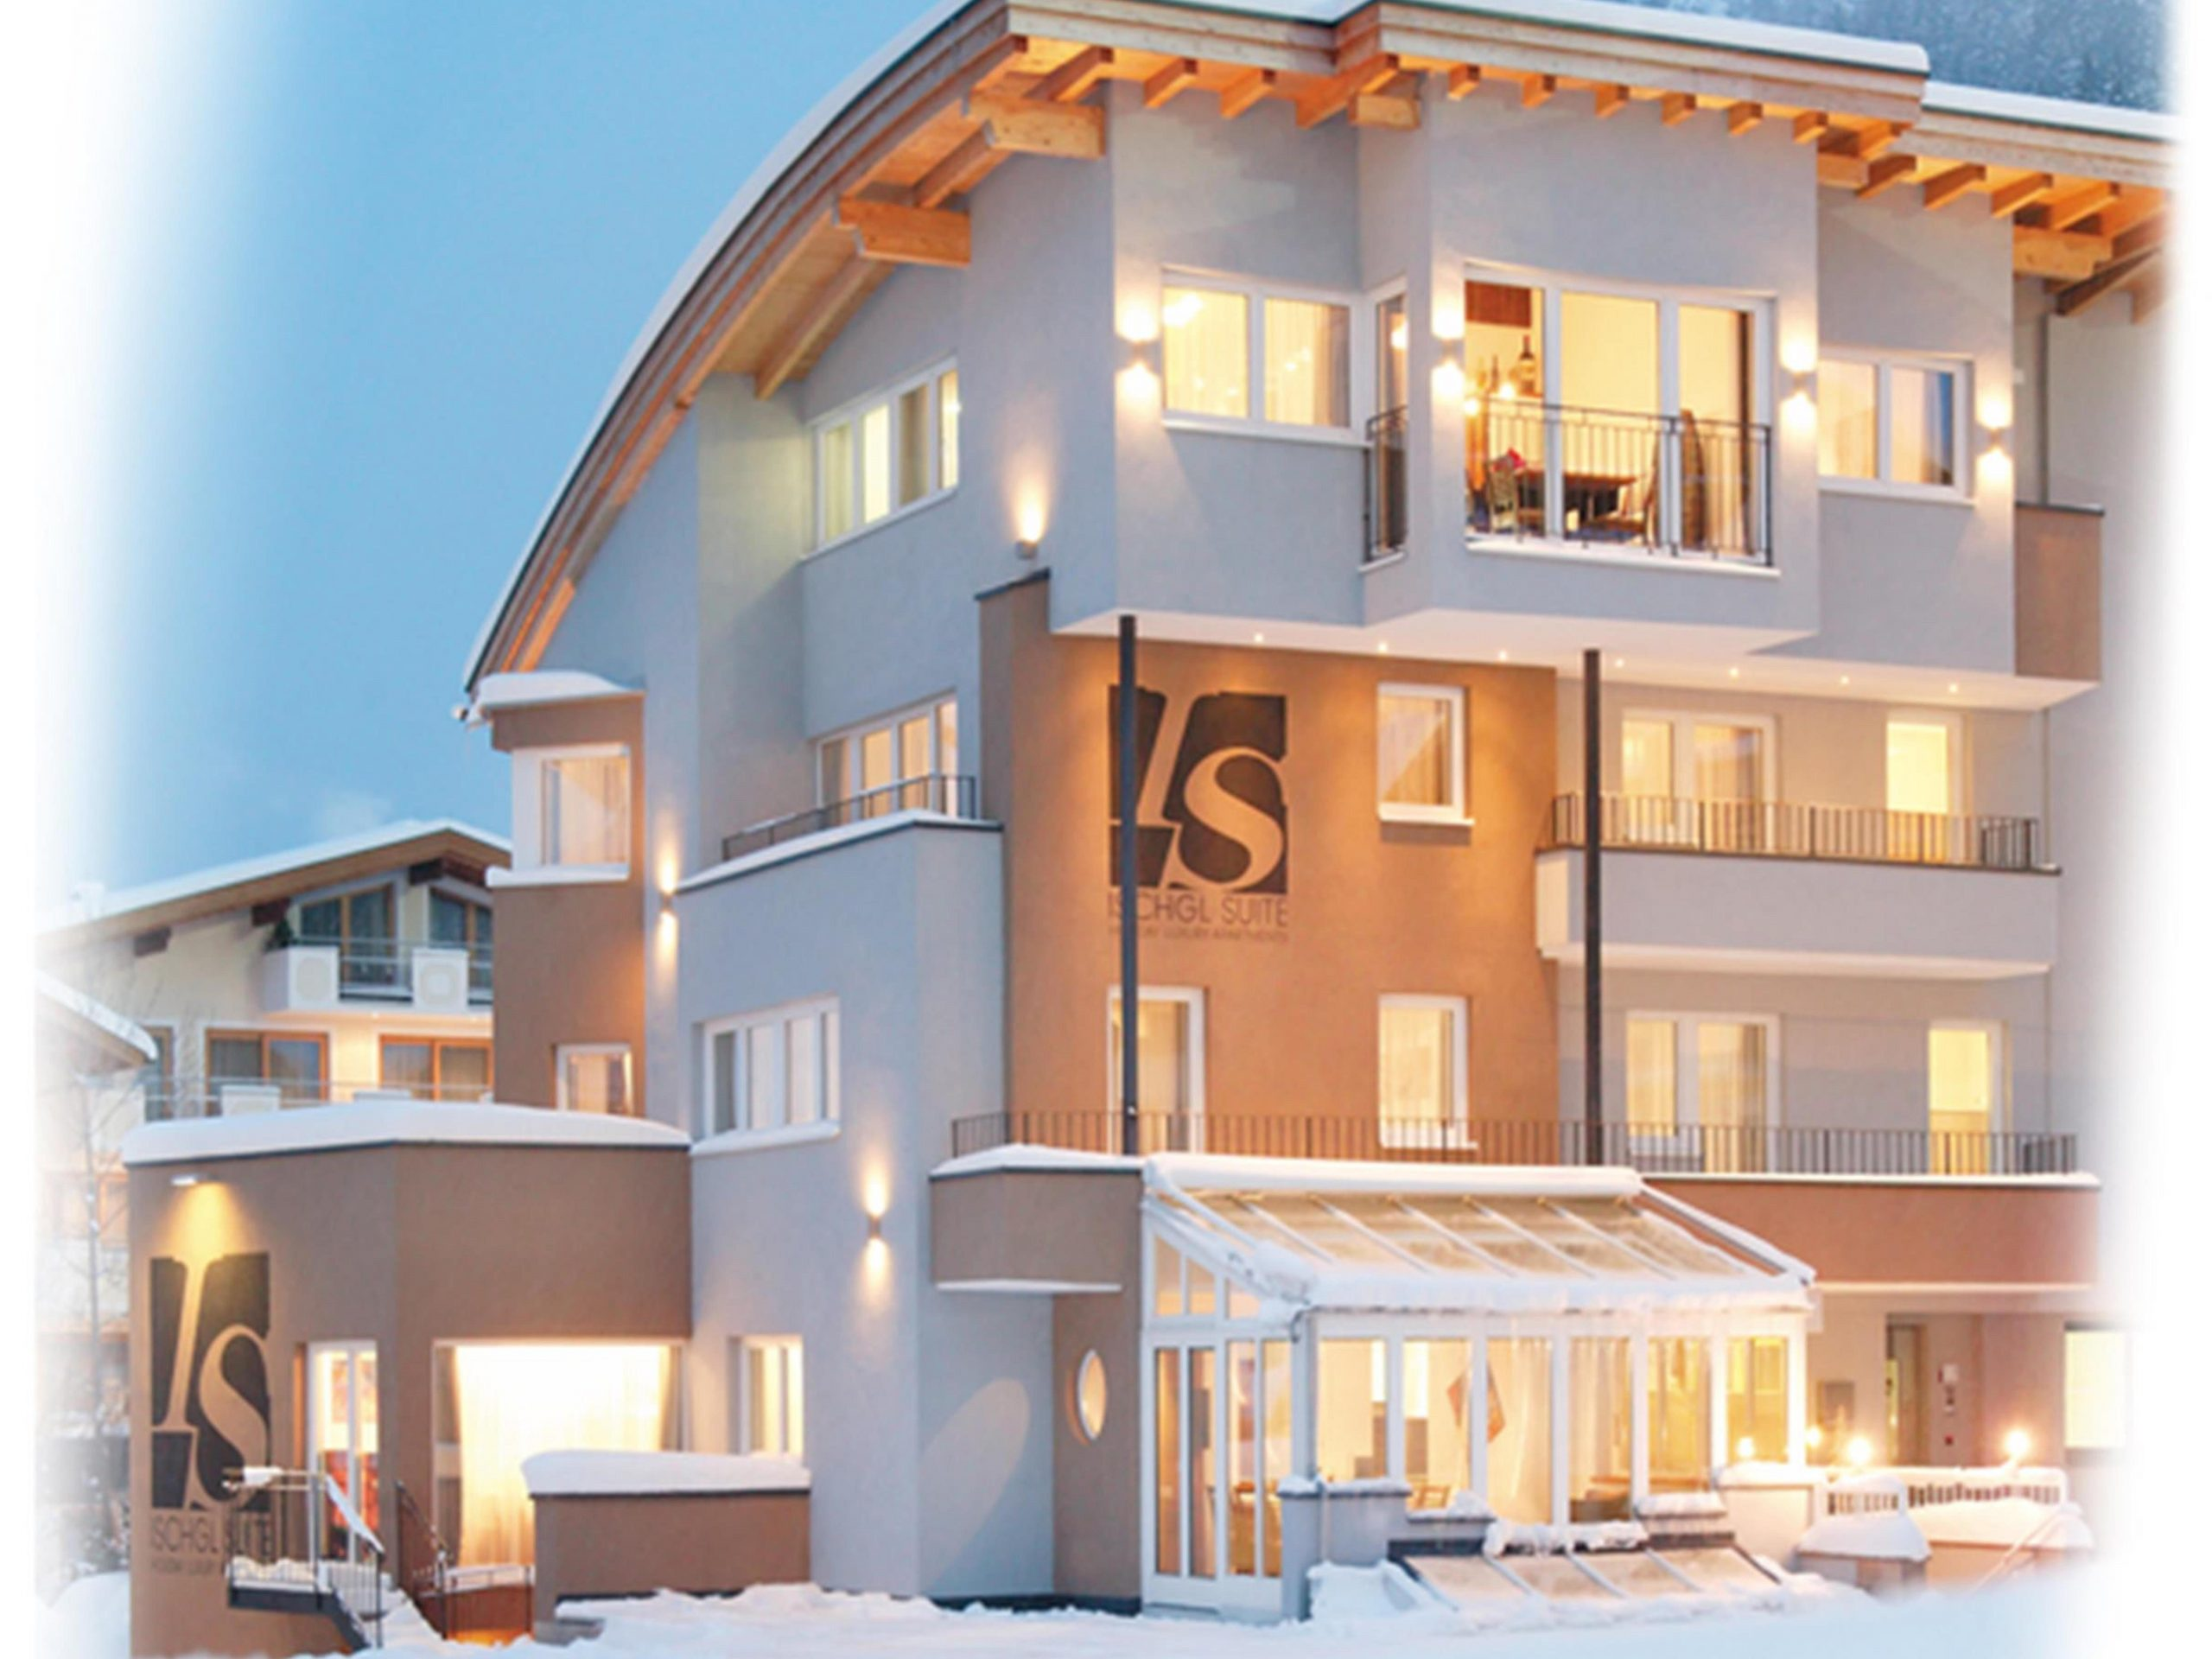 Chalet-appartement Ischgl Suite zondag t/m zondag Panorama - 6-8 personen